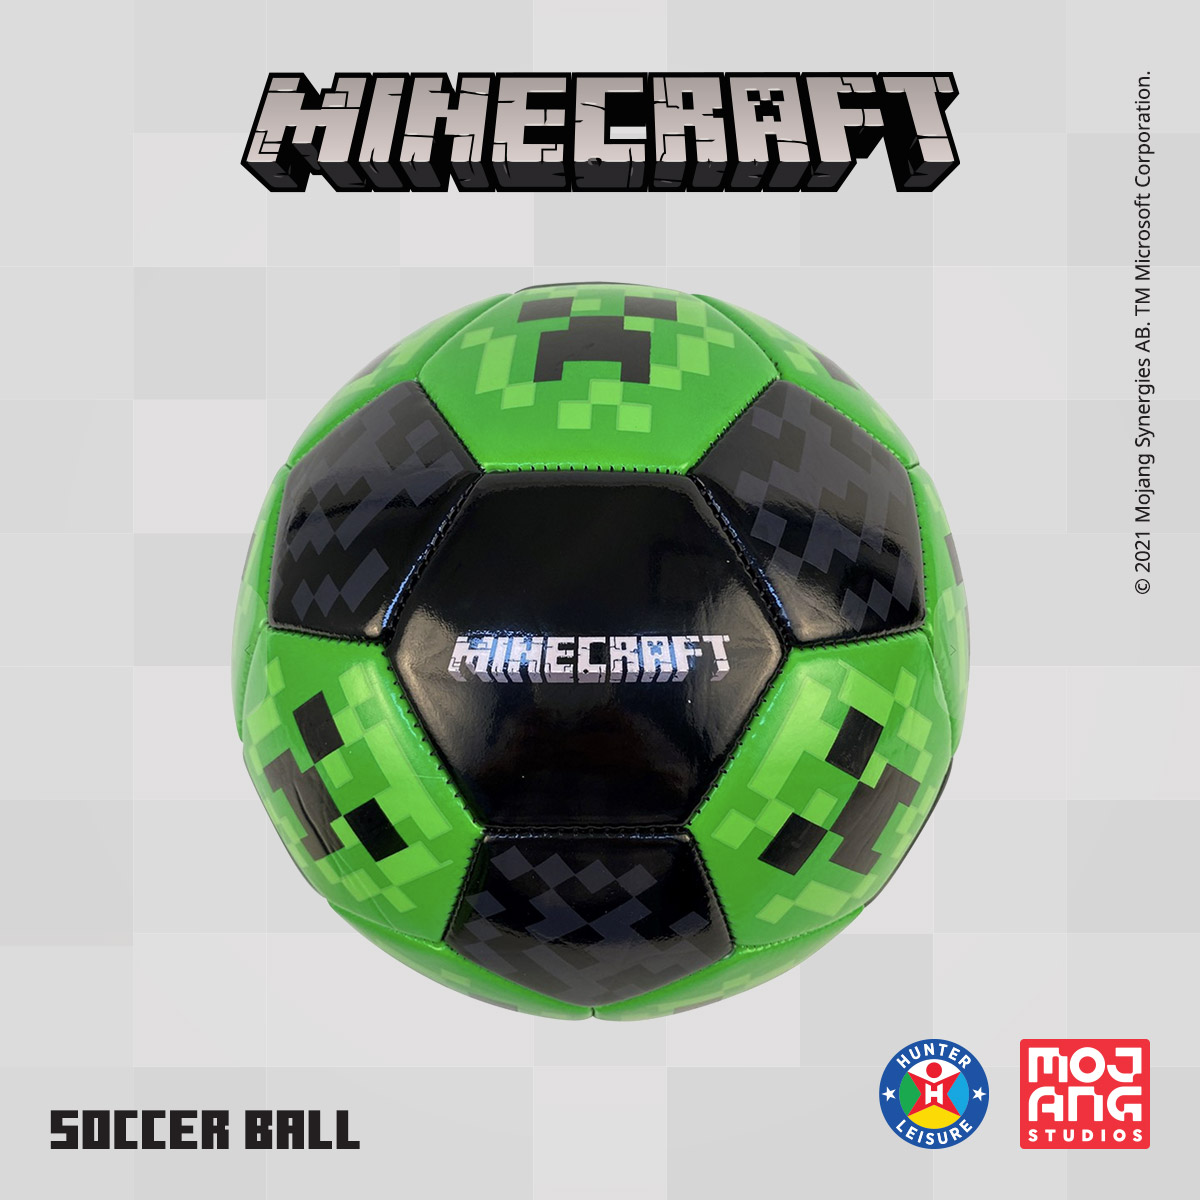 www.hunterleisure.com.au Minecraft Soccer Ball Big W Hunter Leisure